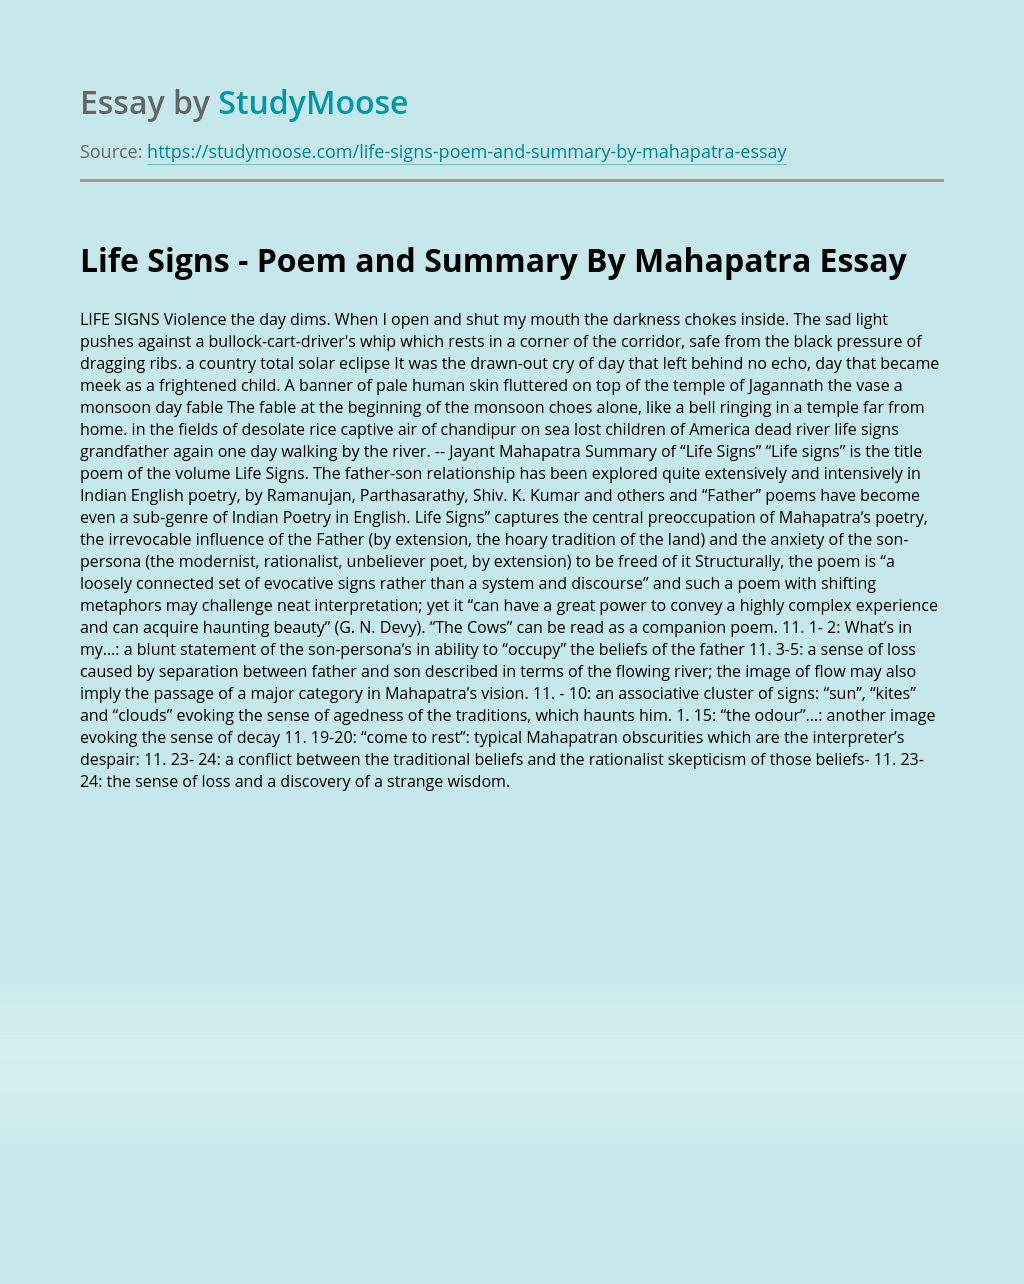 Life Signs - Poem and Summary By Mahapatra